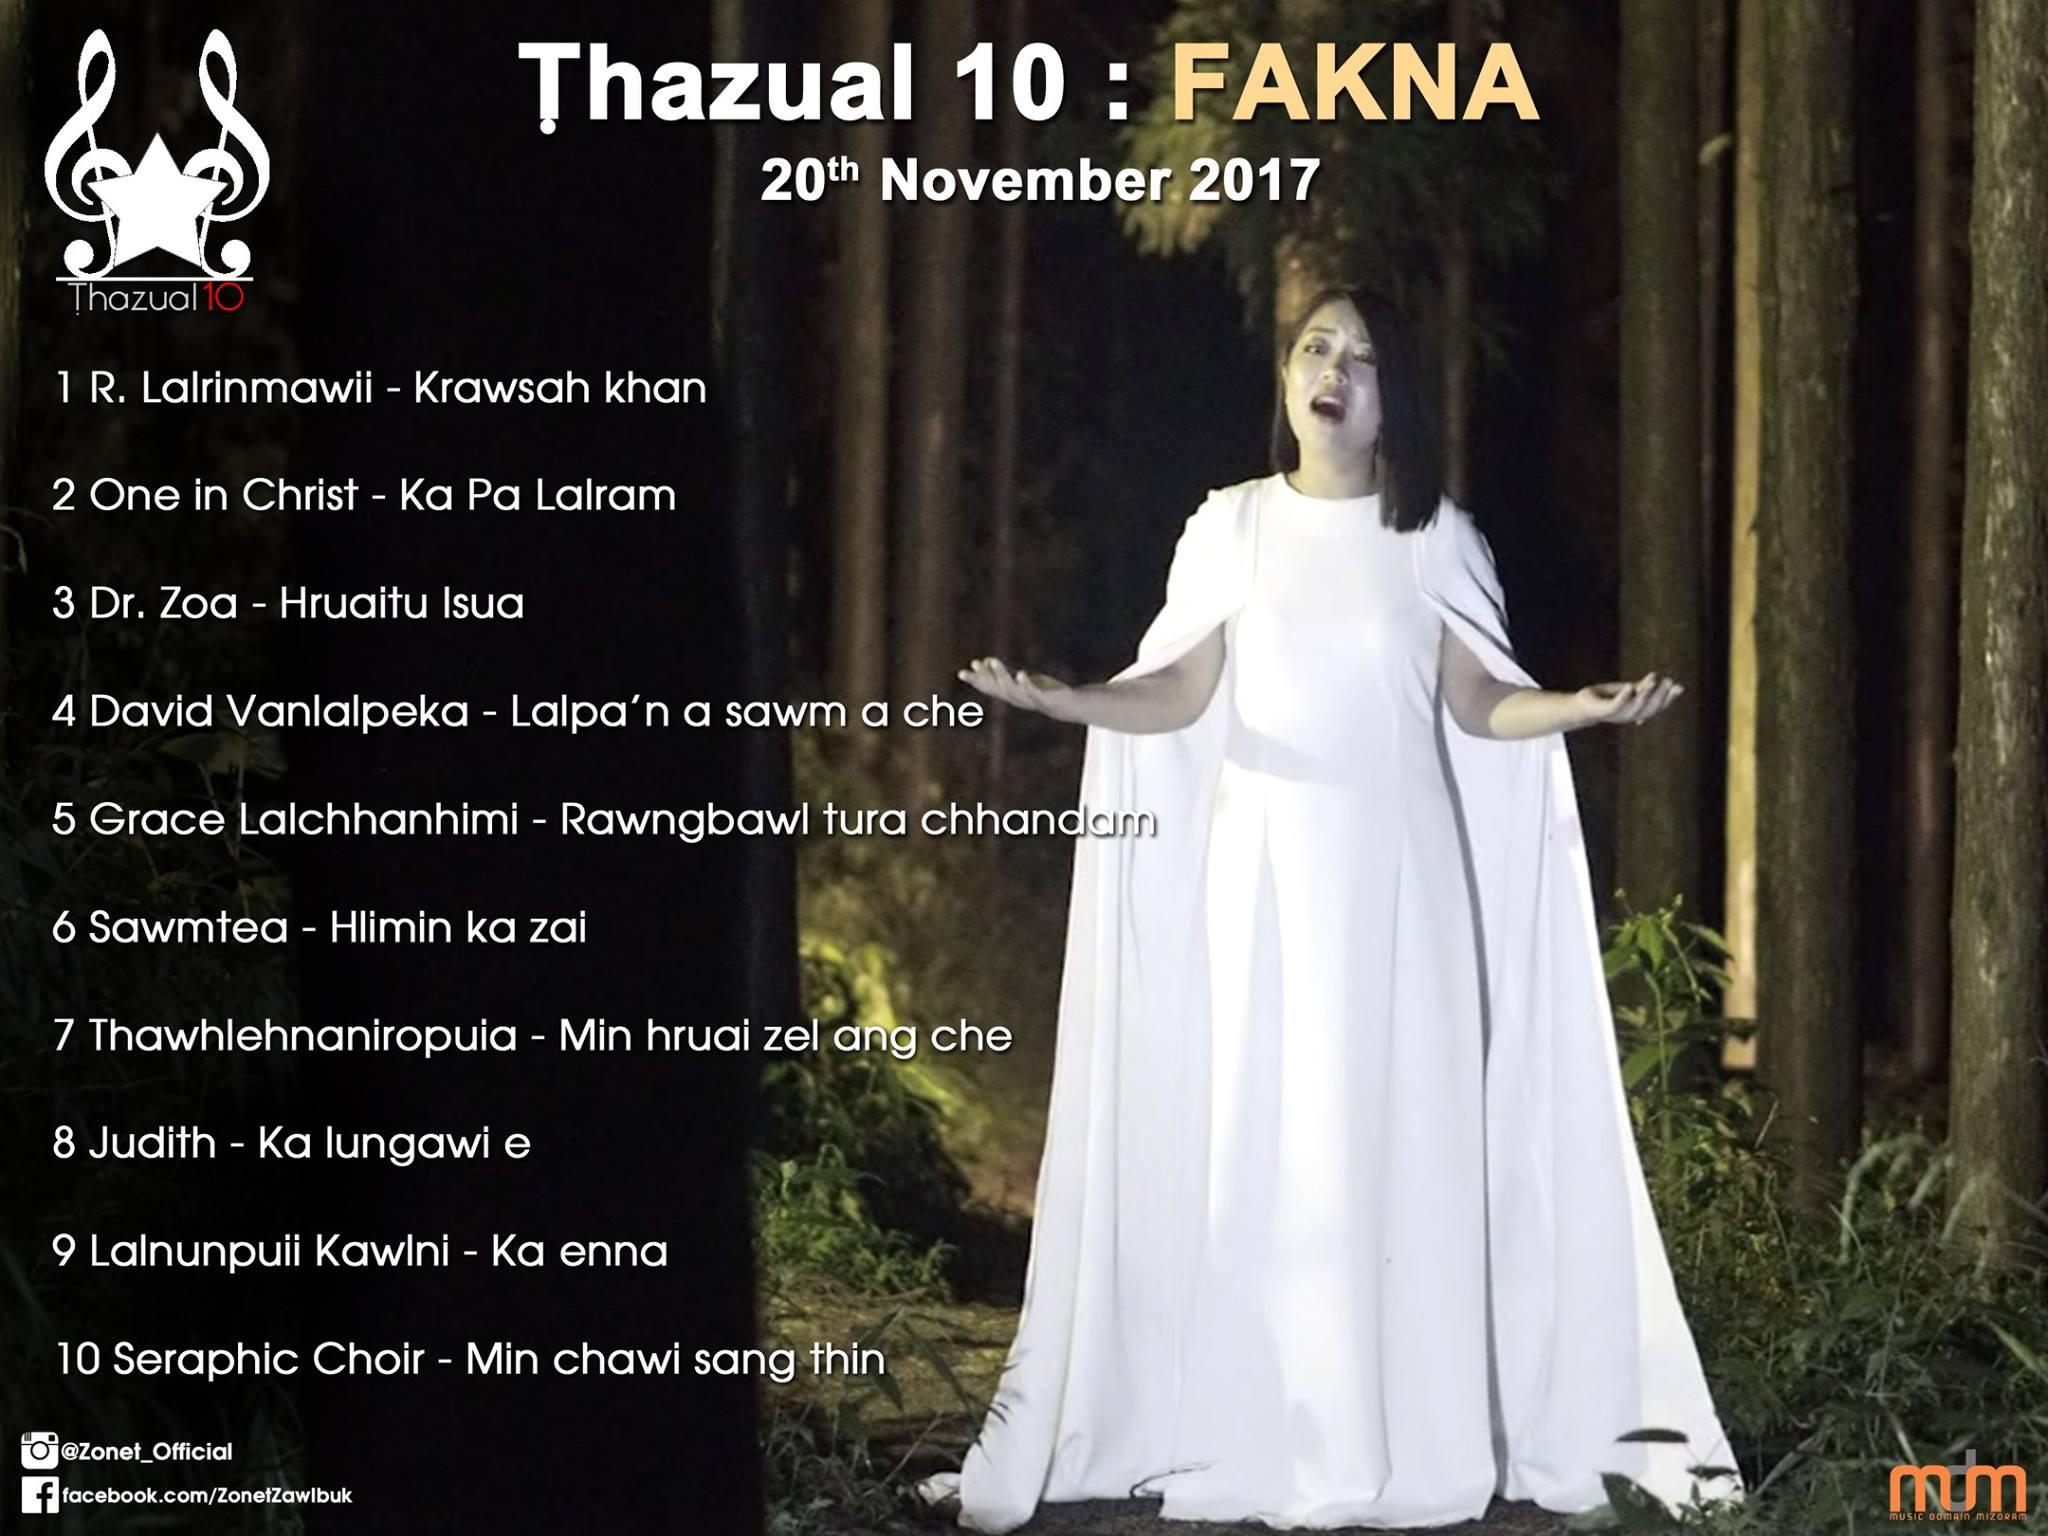 Thazual 10 (Fakna) 21st Nov 2017: Tun kar chart-ah R.Lalrinmawii (Arini) pakhatna a ni